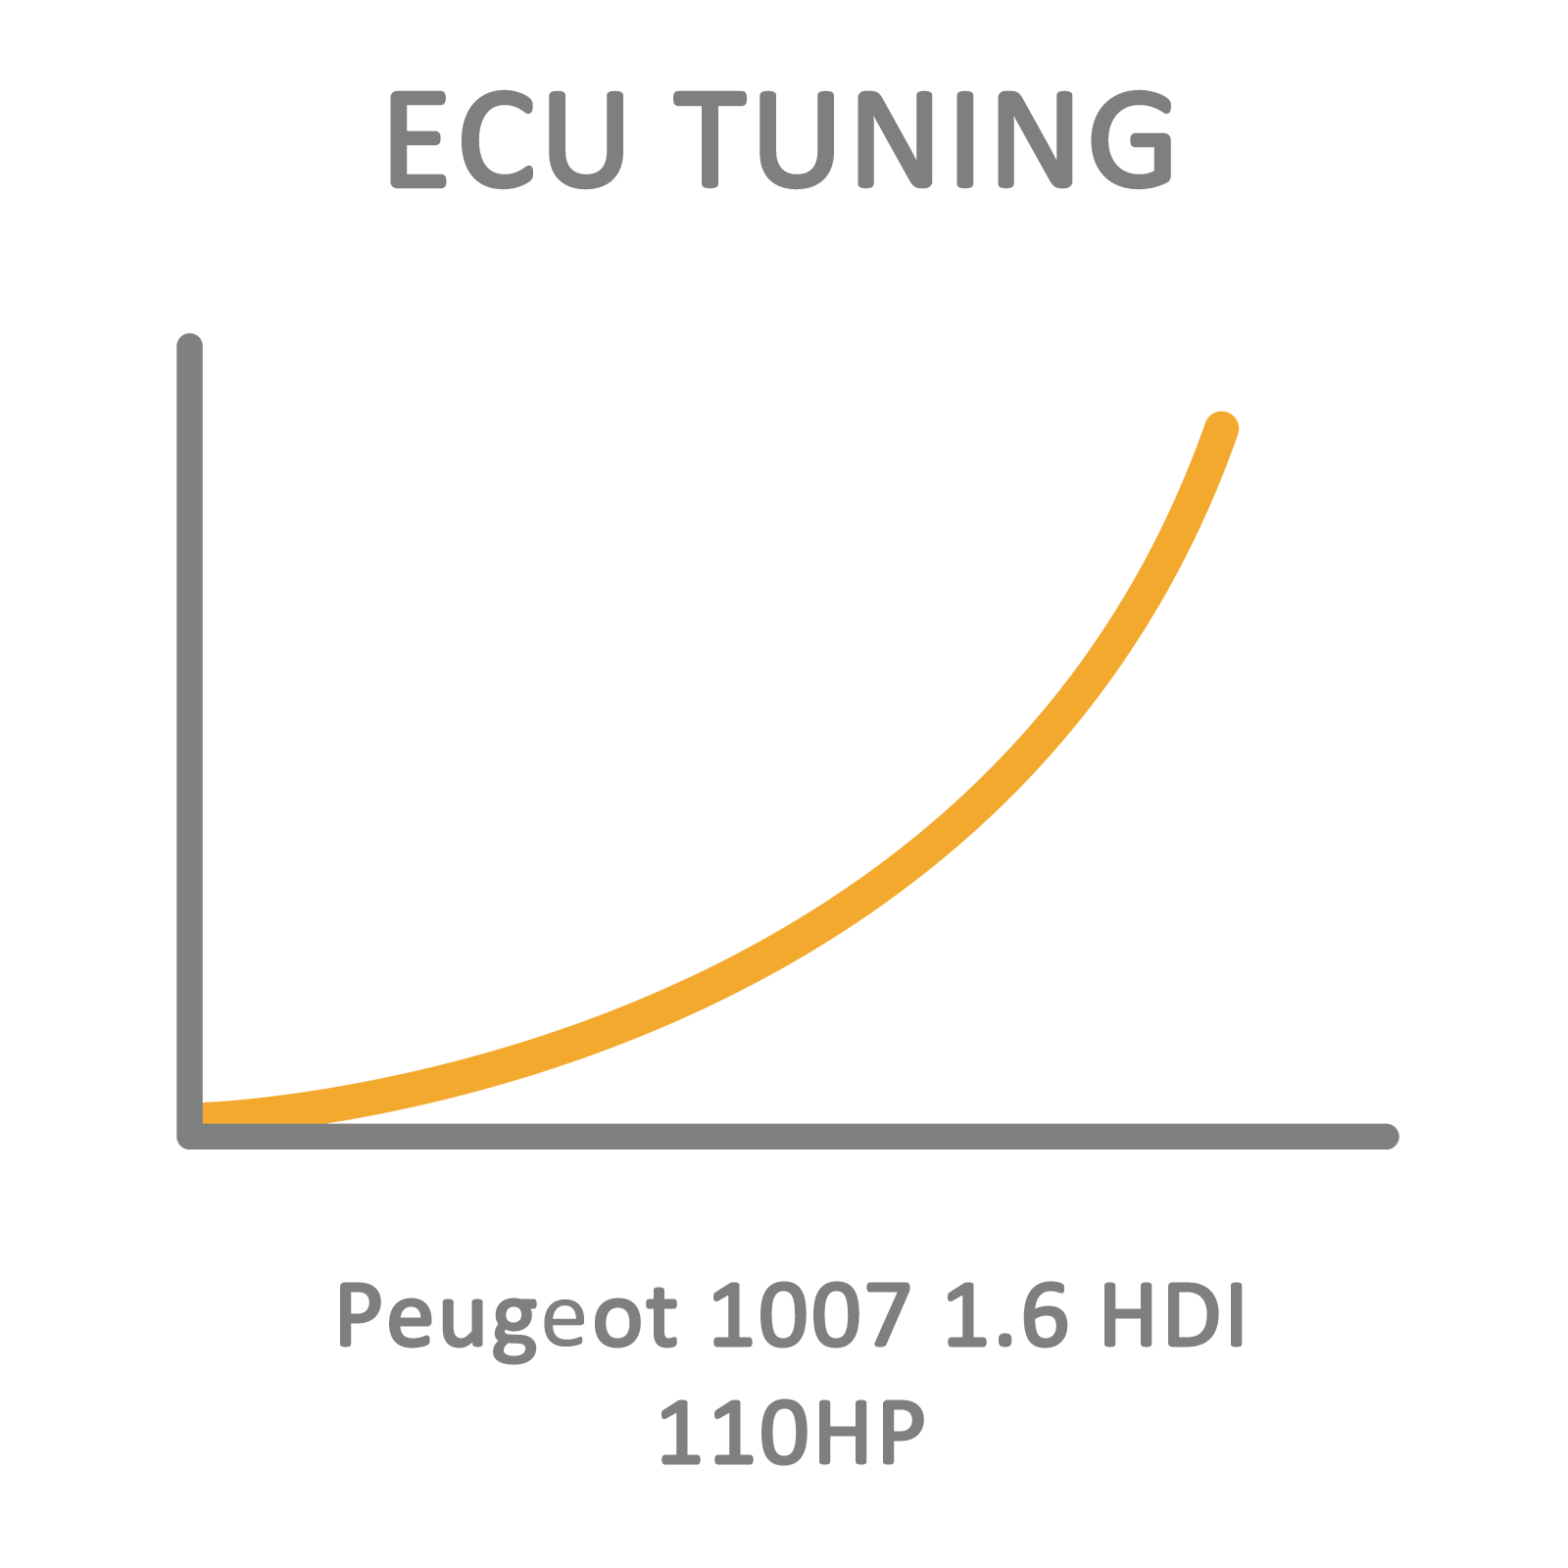 Peugeot 1007 1.6 HDI 110HP ECU Tuning Remapping Programming